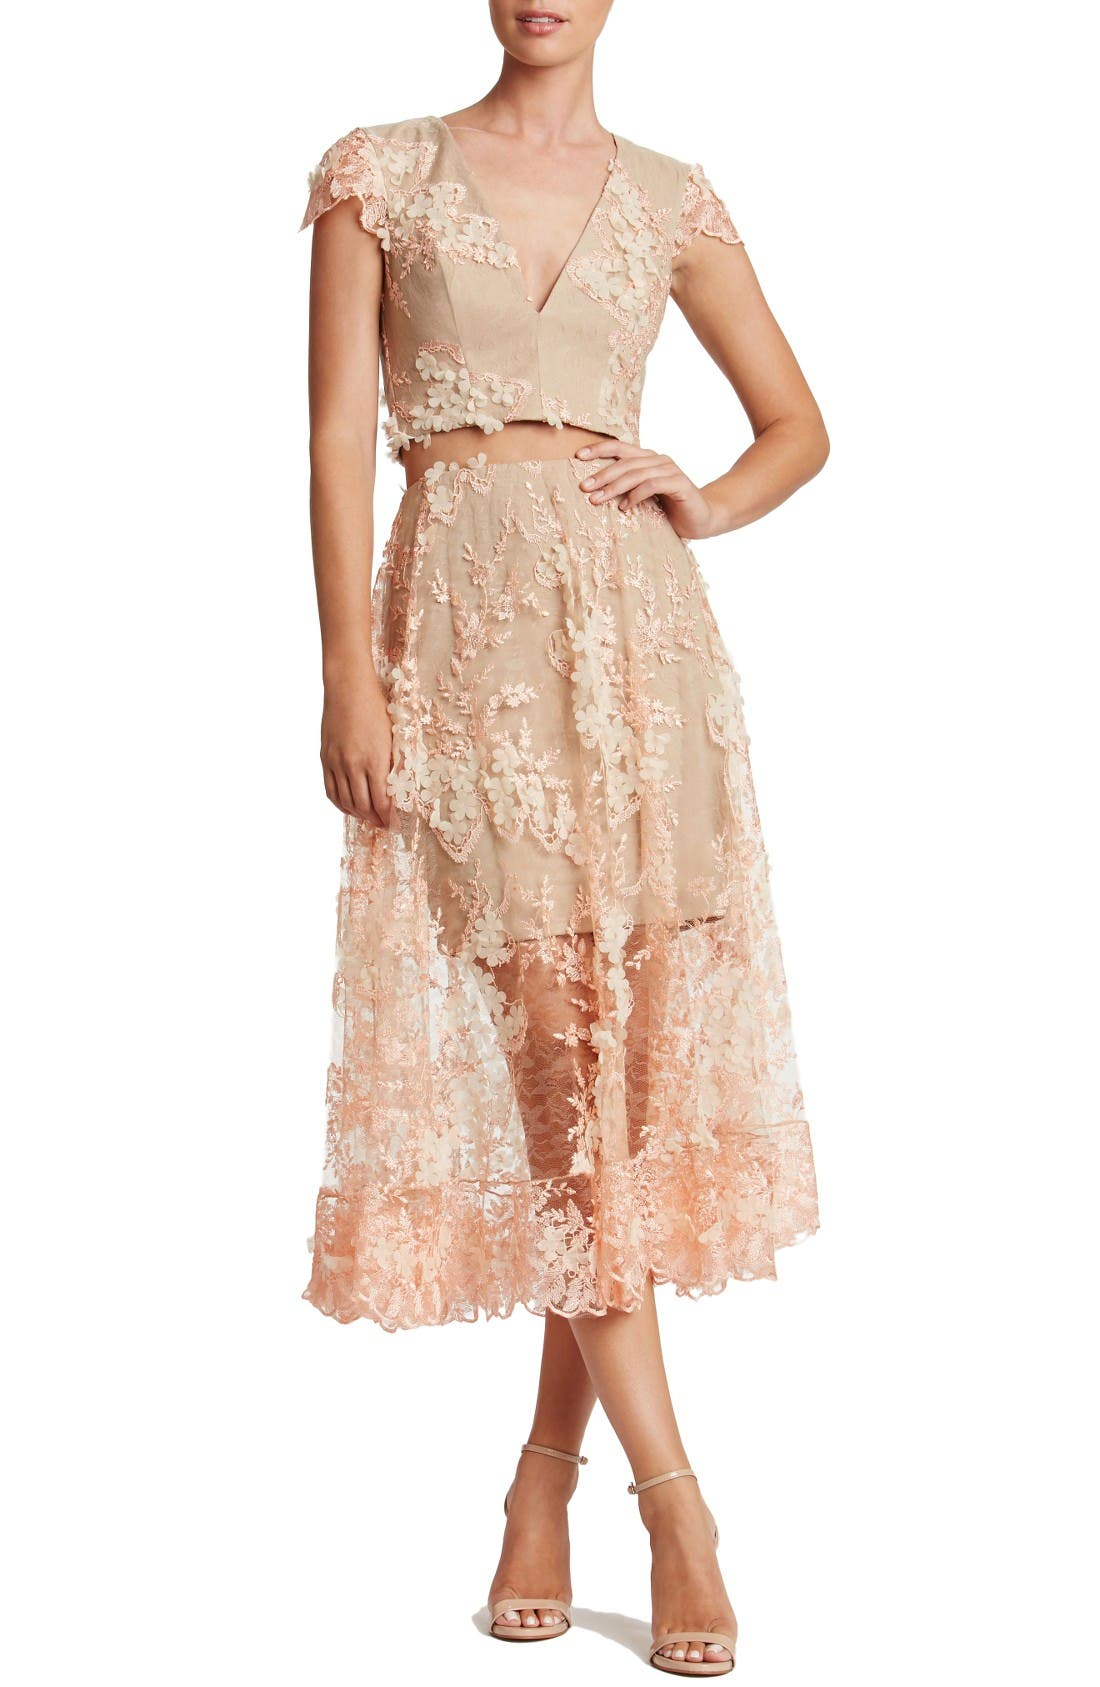 Alternate Image 1 Selected - Dress the Population Juliana Two-Piece Dress